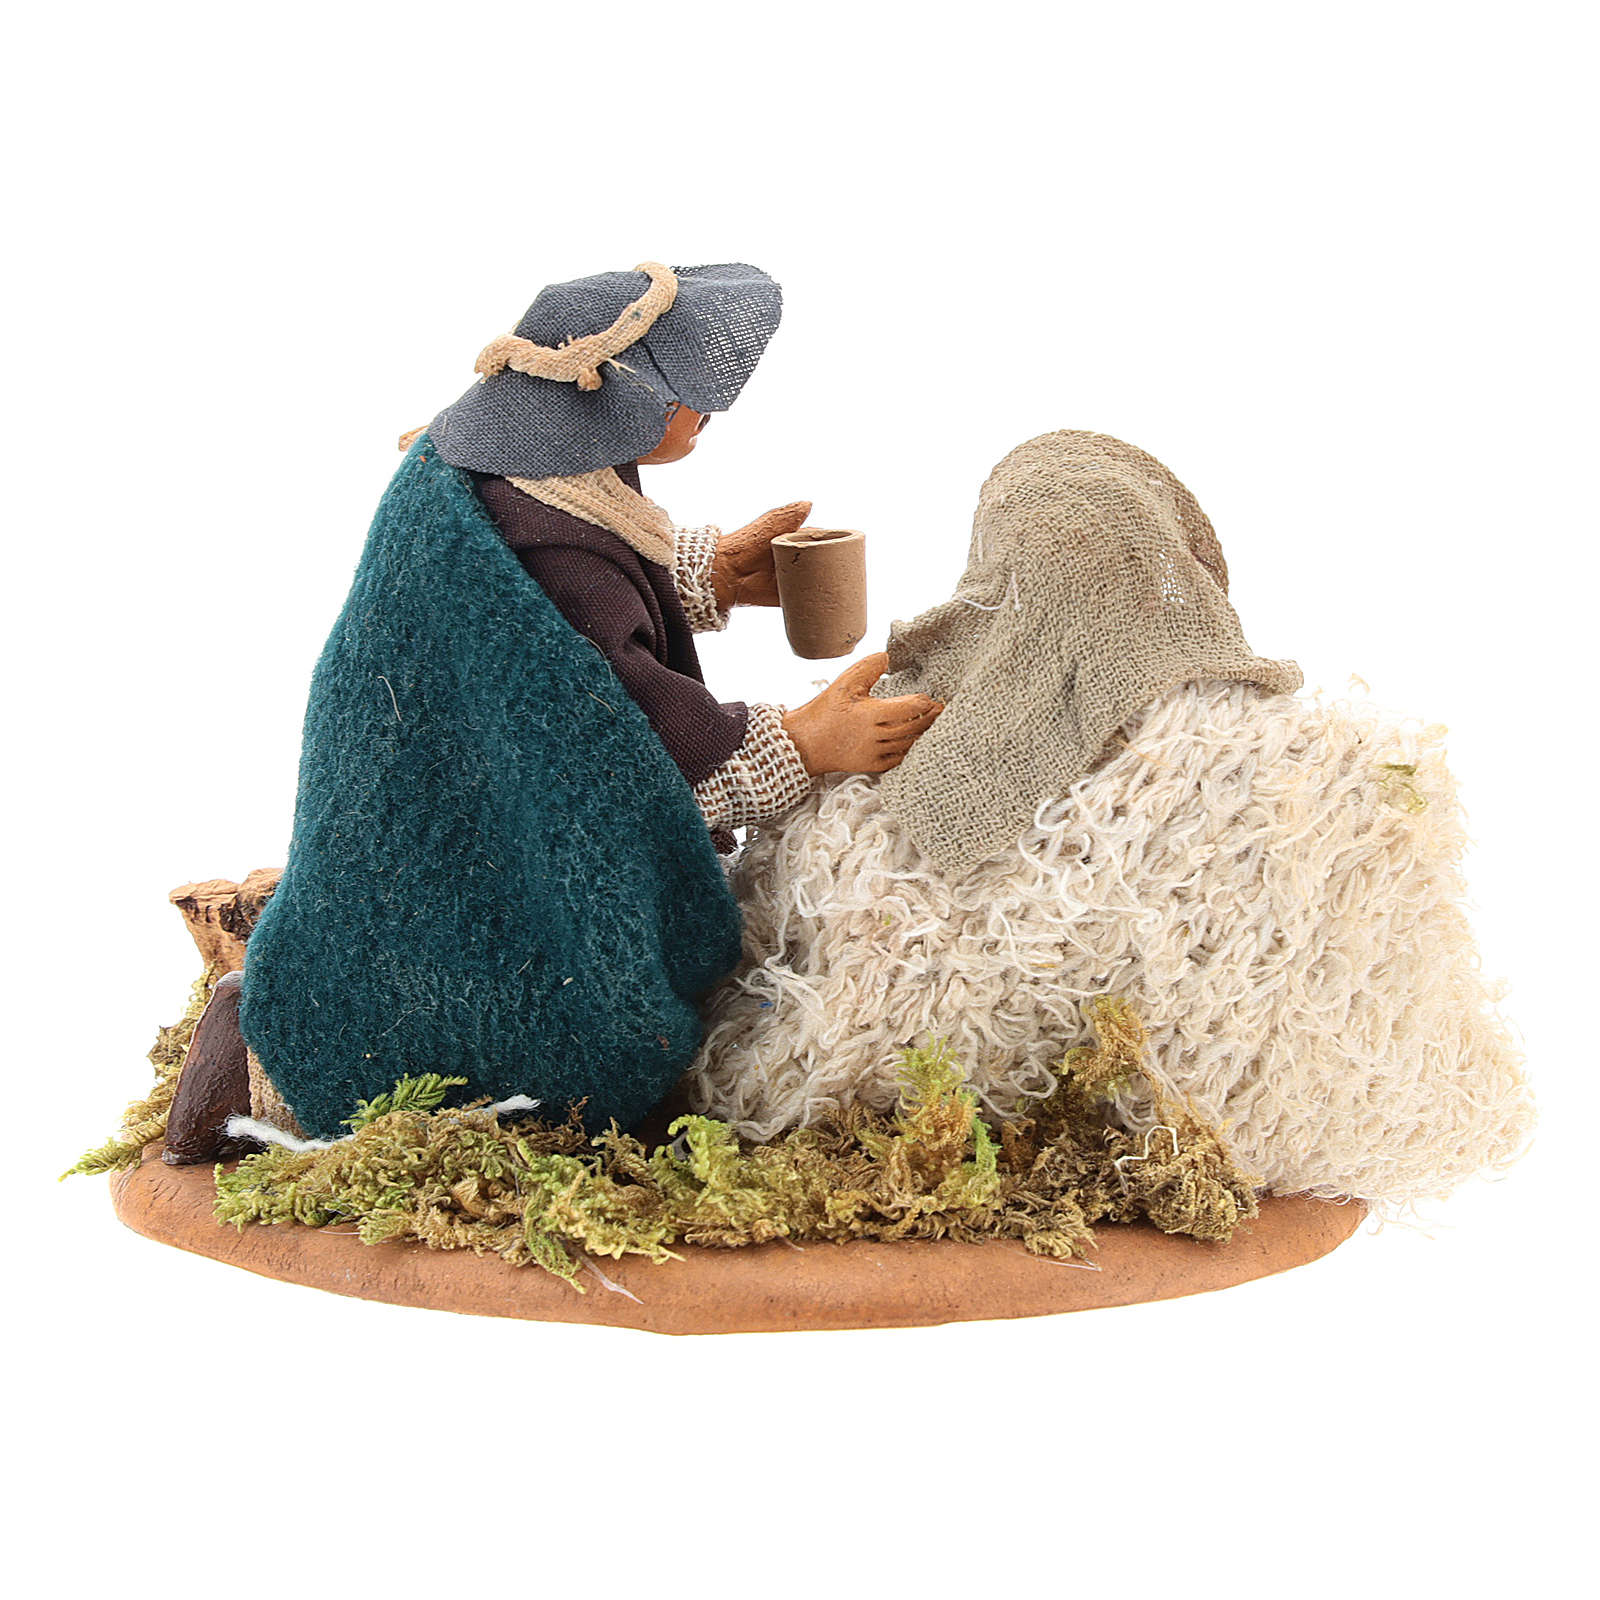 Ecsena de la misericordia 10 cm belén Nápoles 4